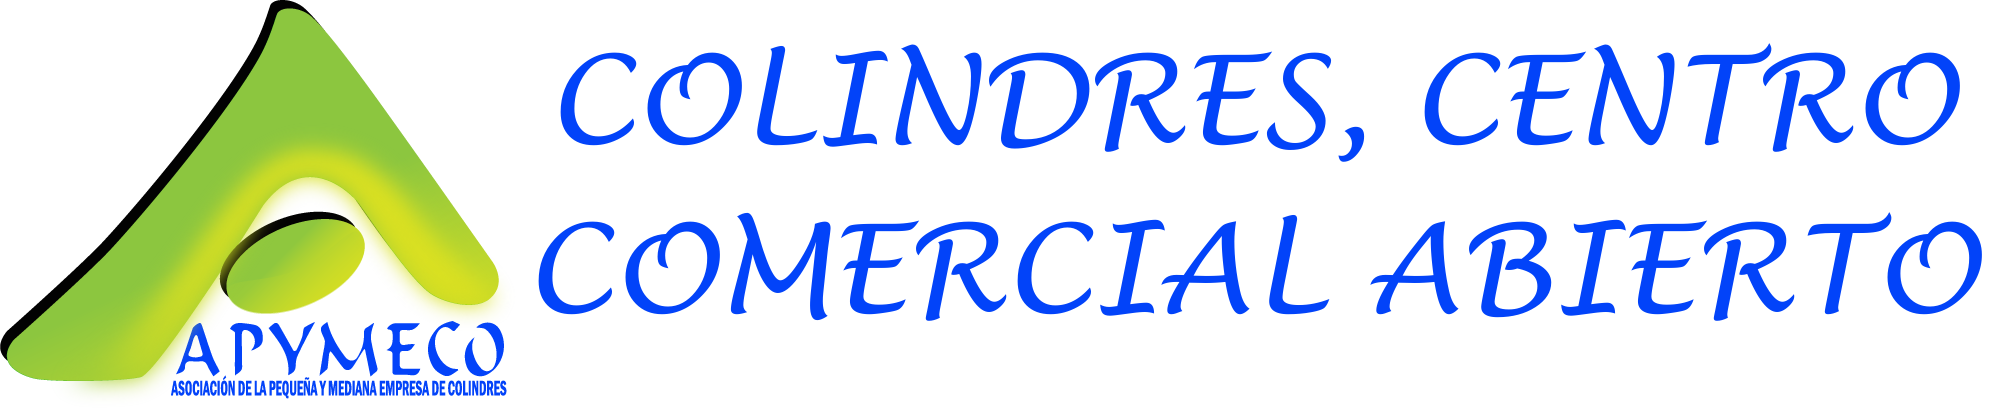 Colindres, Centro Comercial Abierto